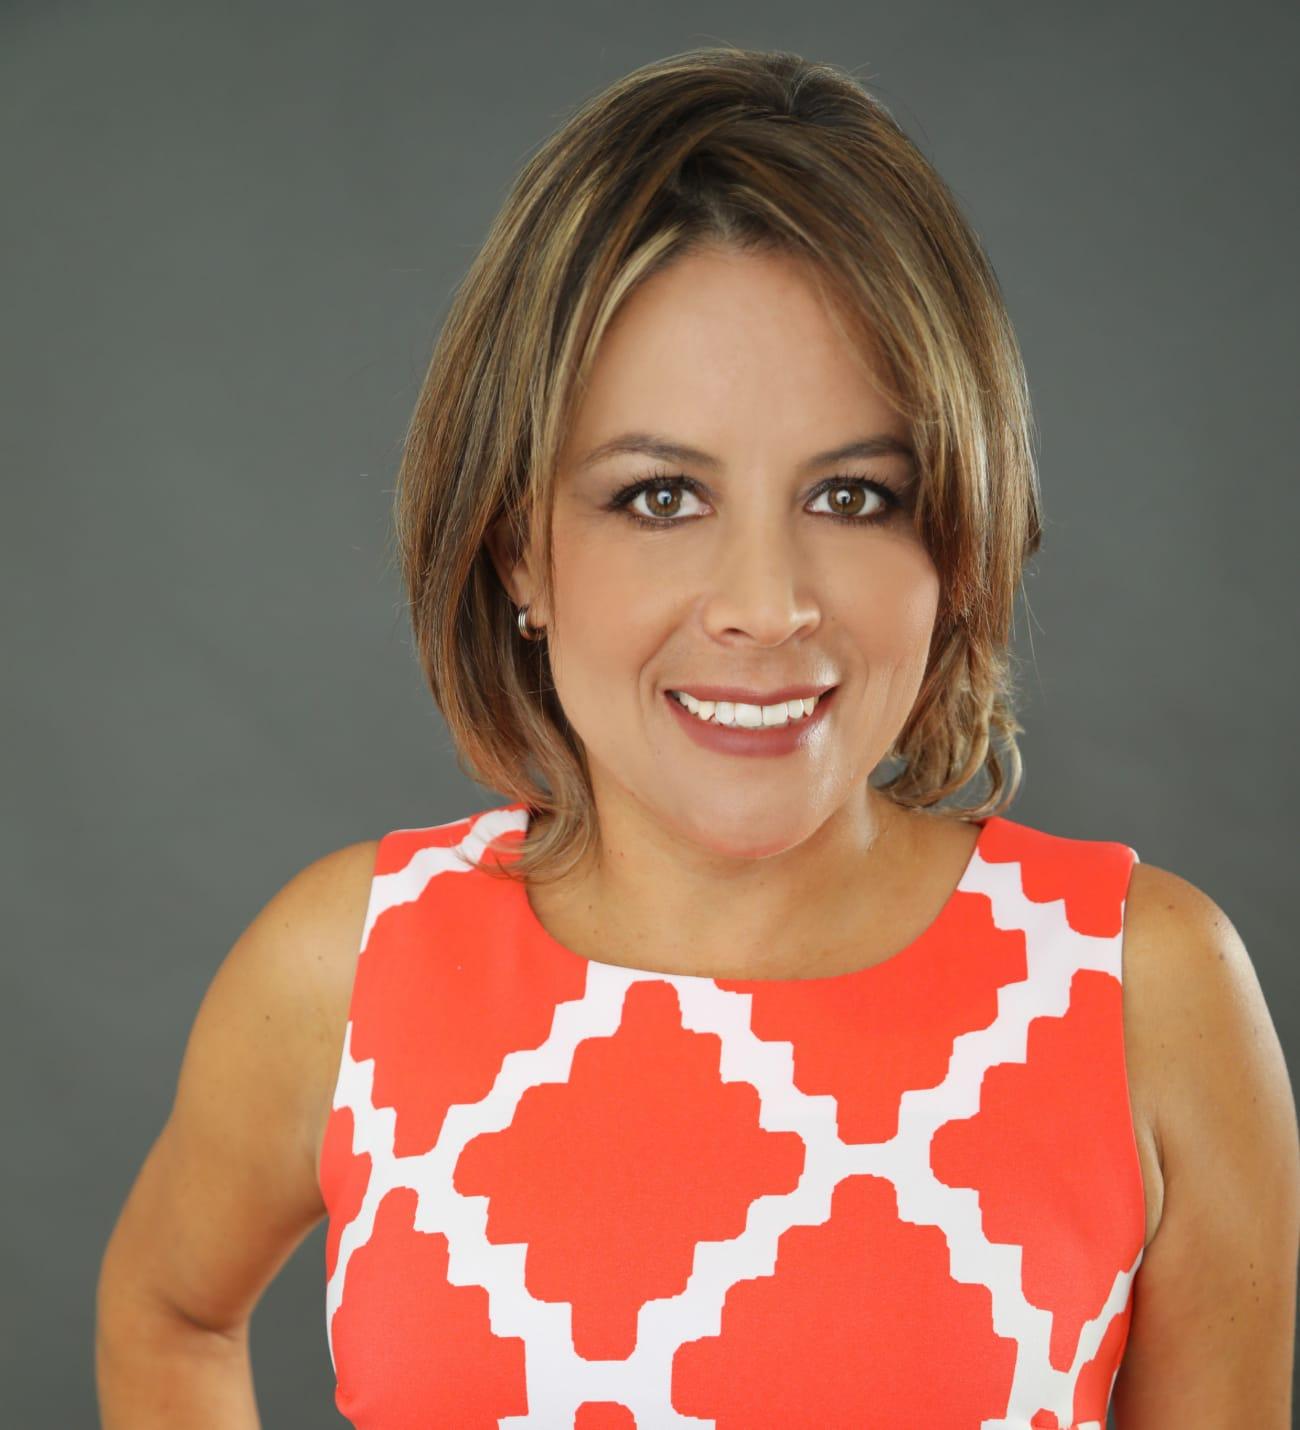 Sandra Arroyave